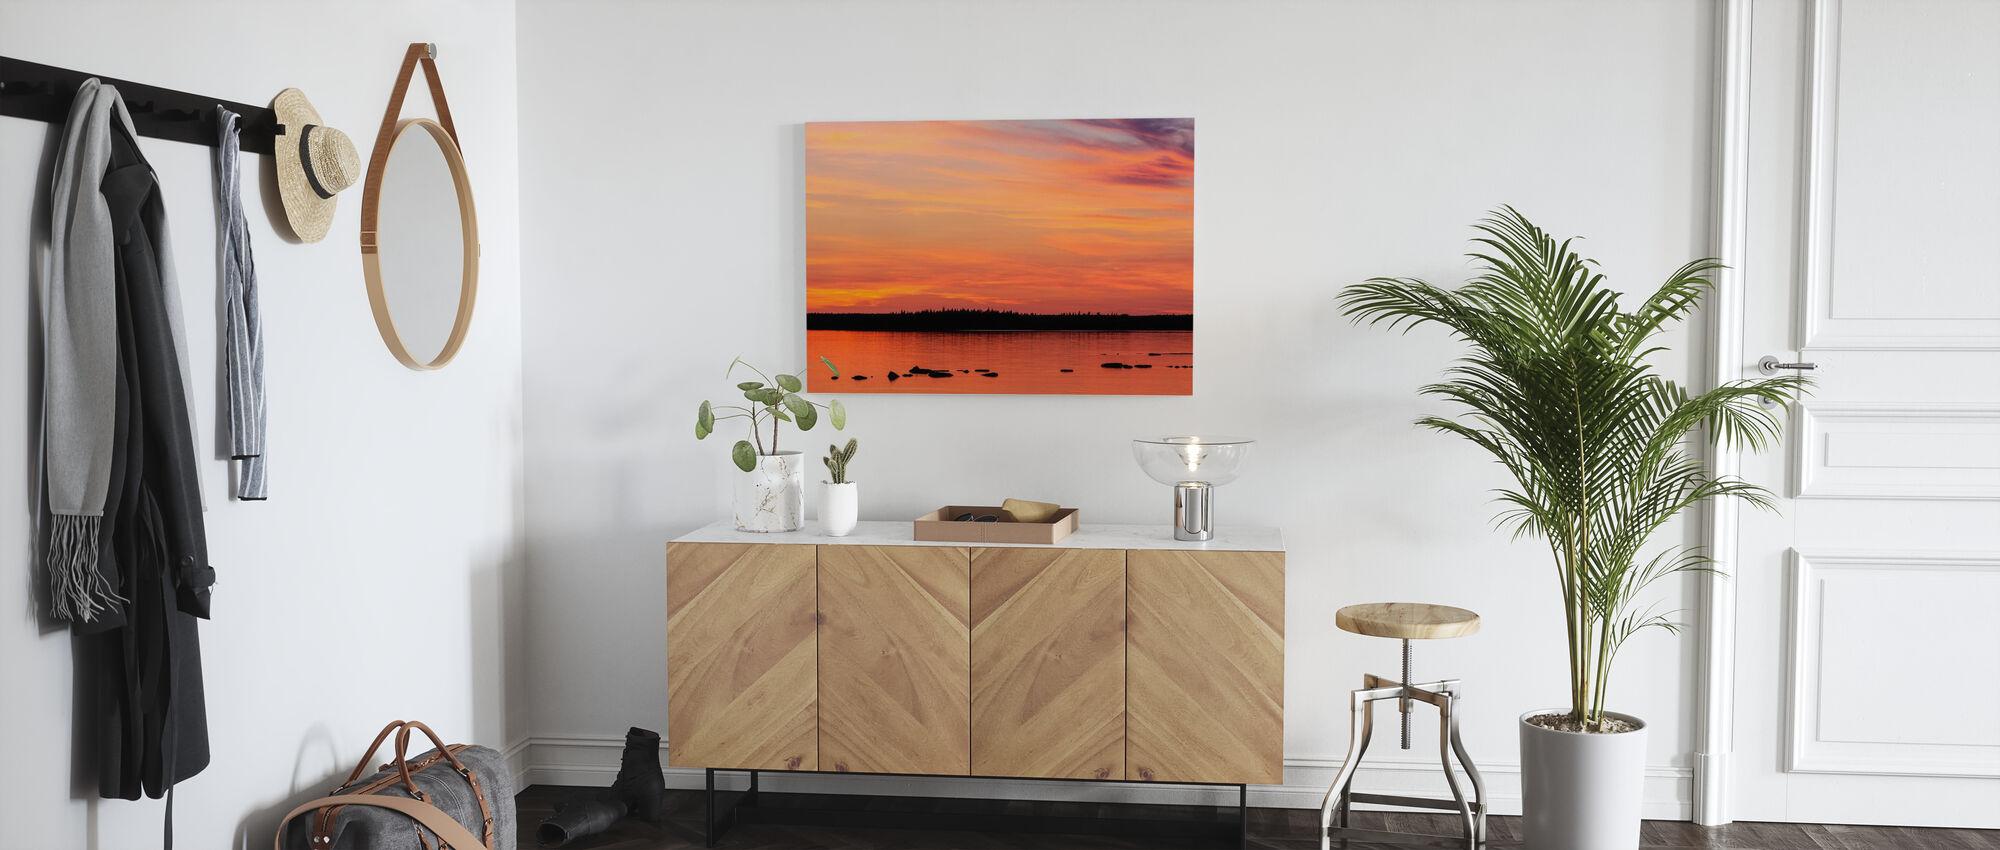 Sunset, Gotland - Canvas print - Hallway